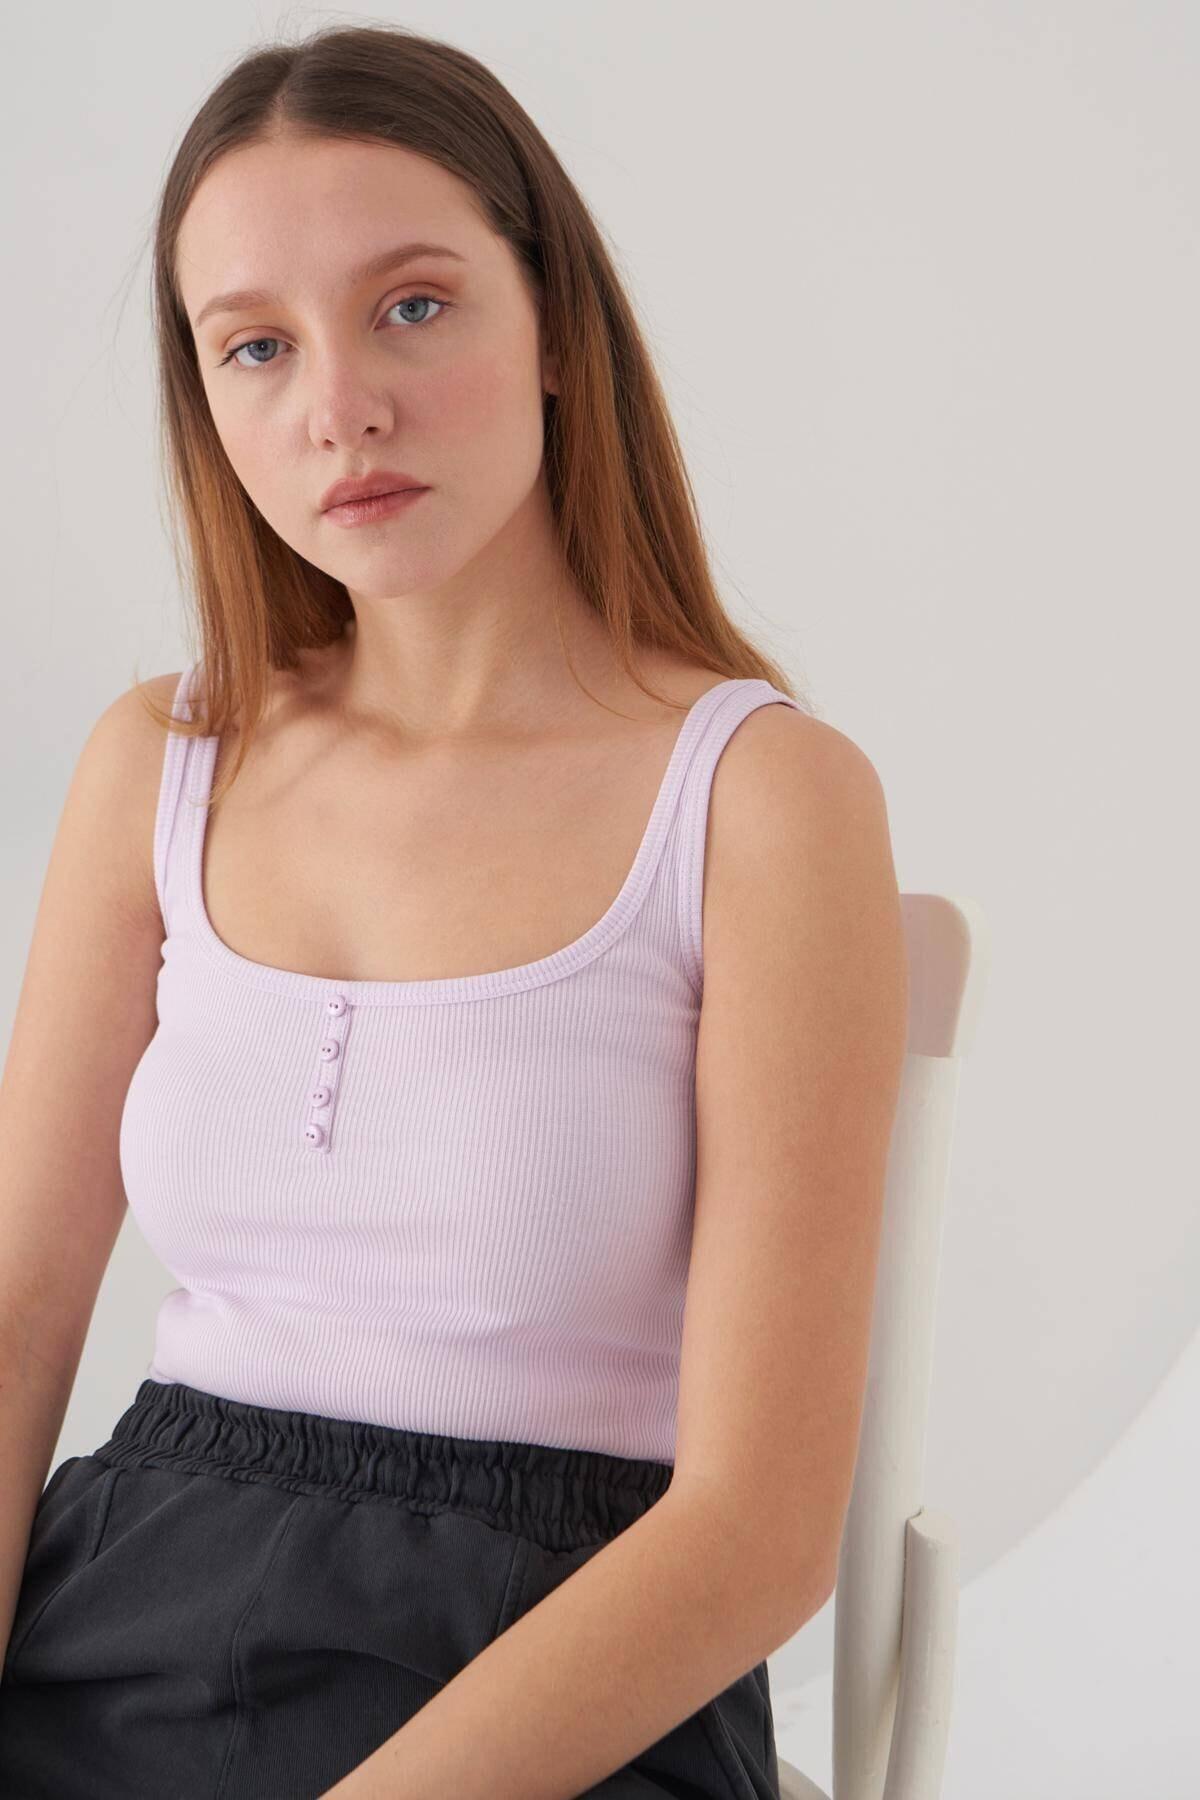 Addax Kadın Açık Lila Askılı Bluz A0963 - Dk11 Adx-0000022397 2